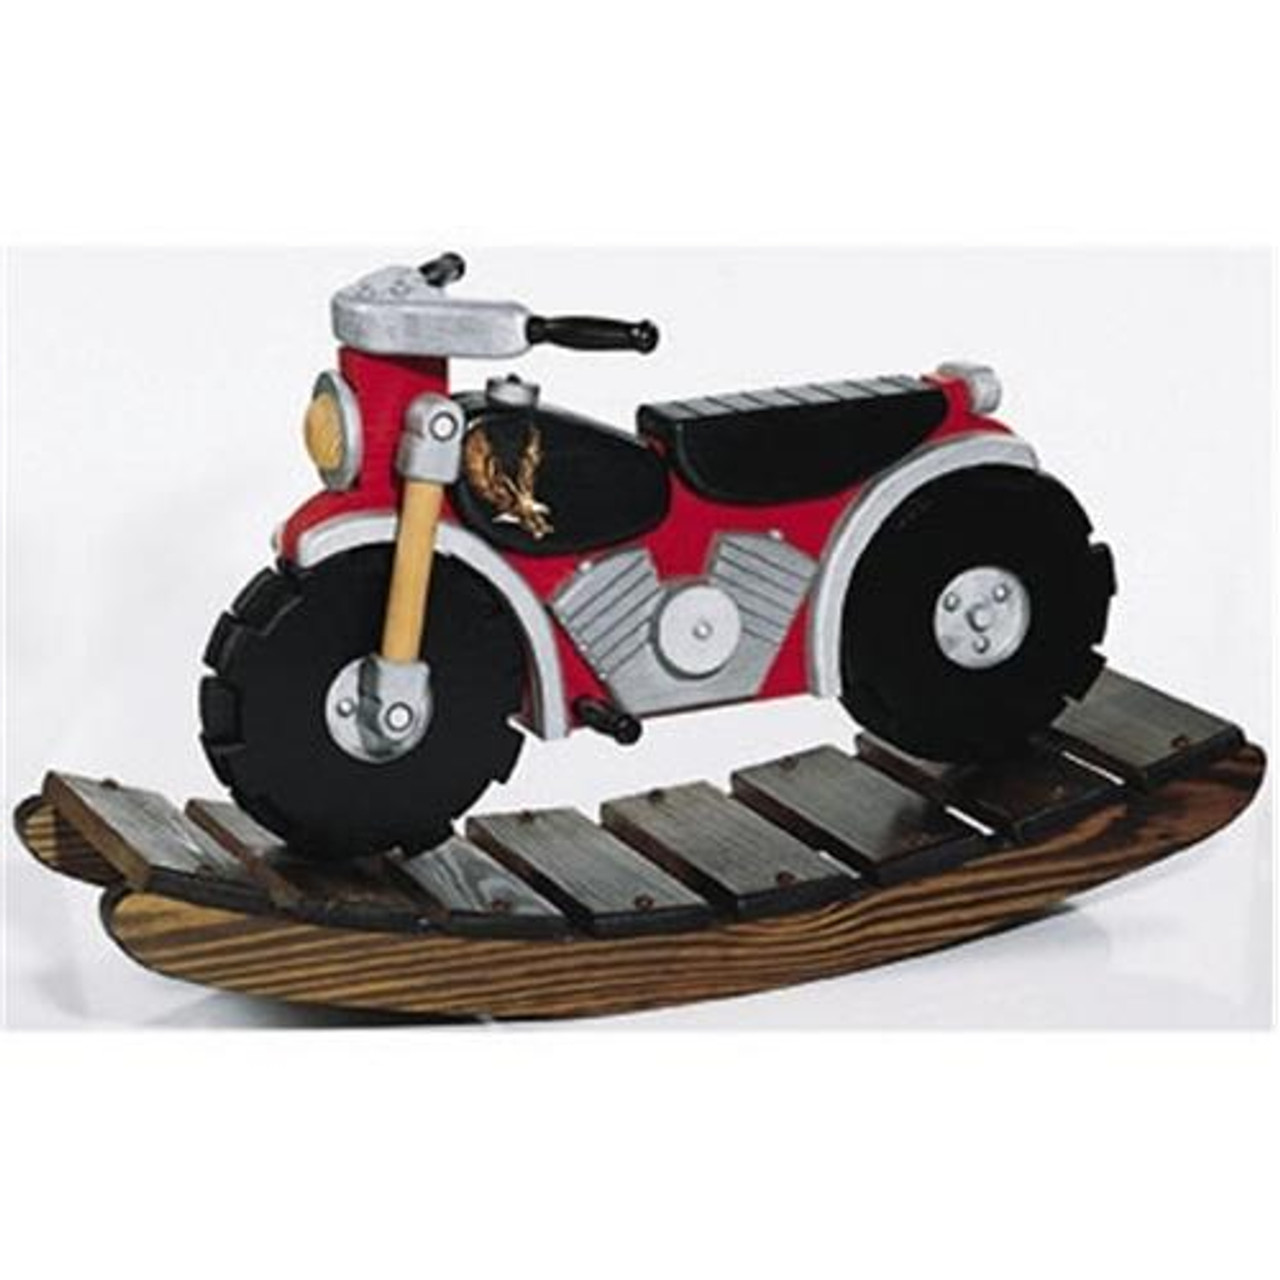 Cherry Tree Toys Motorcycle Rocker Parts Kit